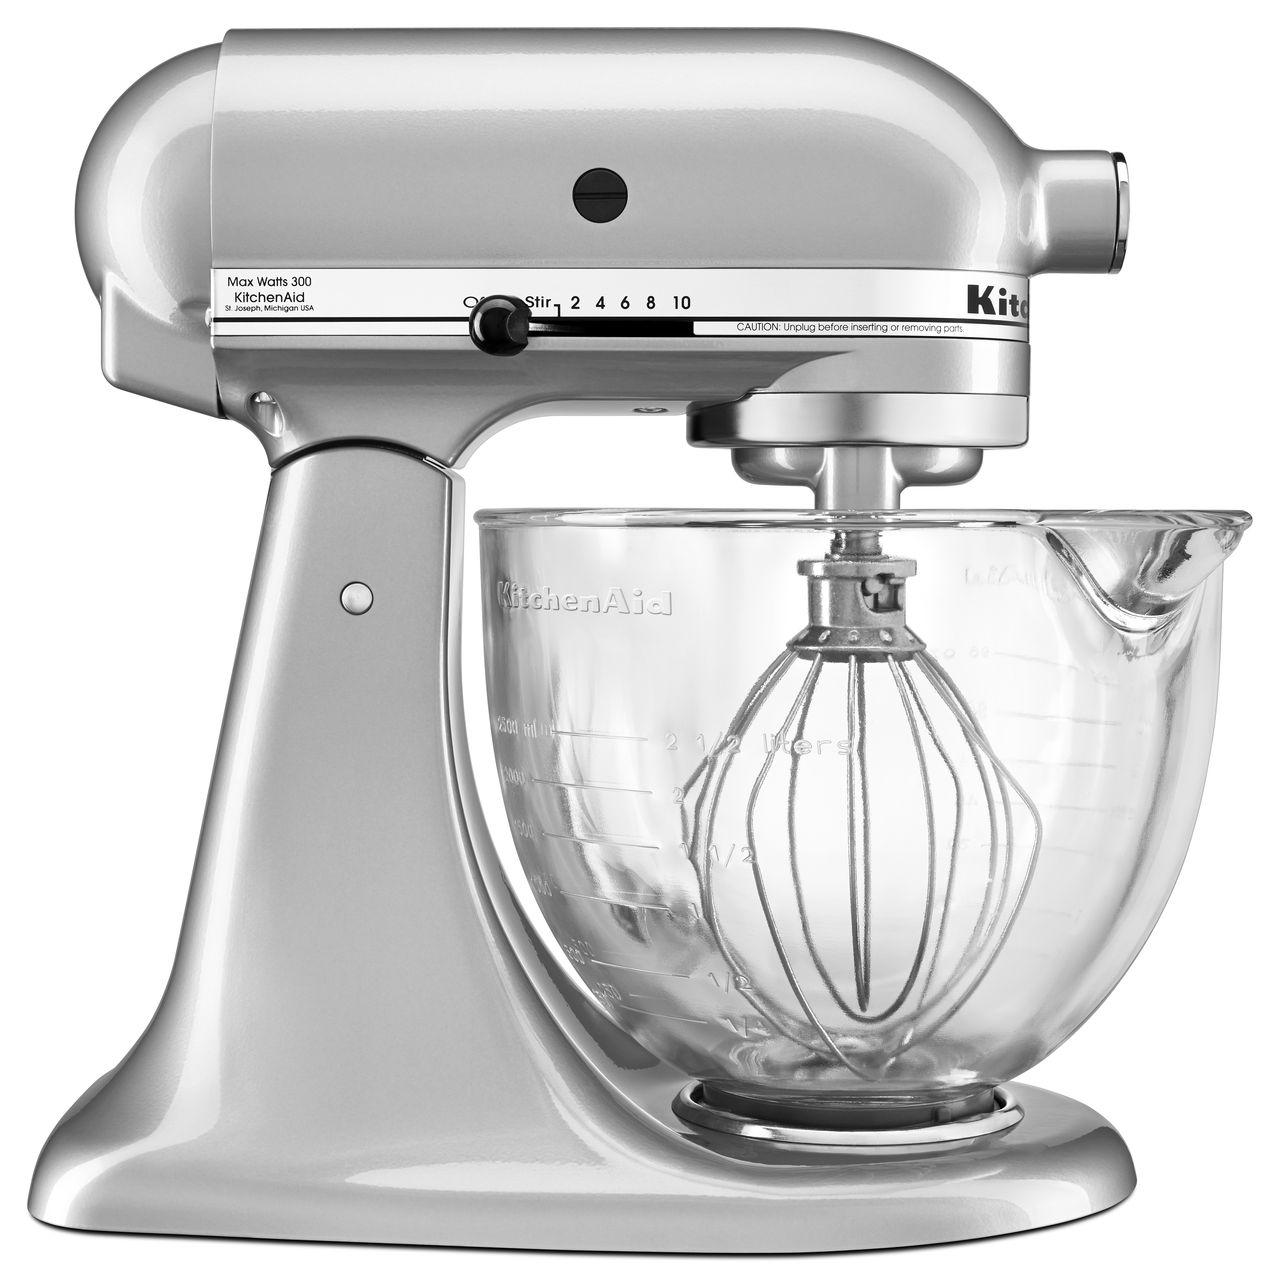 Kitchenaid 174 5 Quart Tilt Head Stand Mixer With Glass Bowl